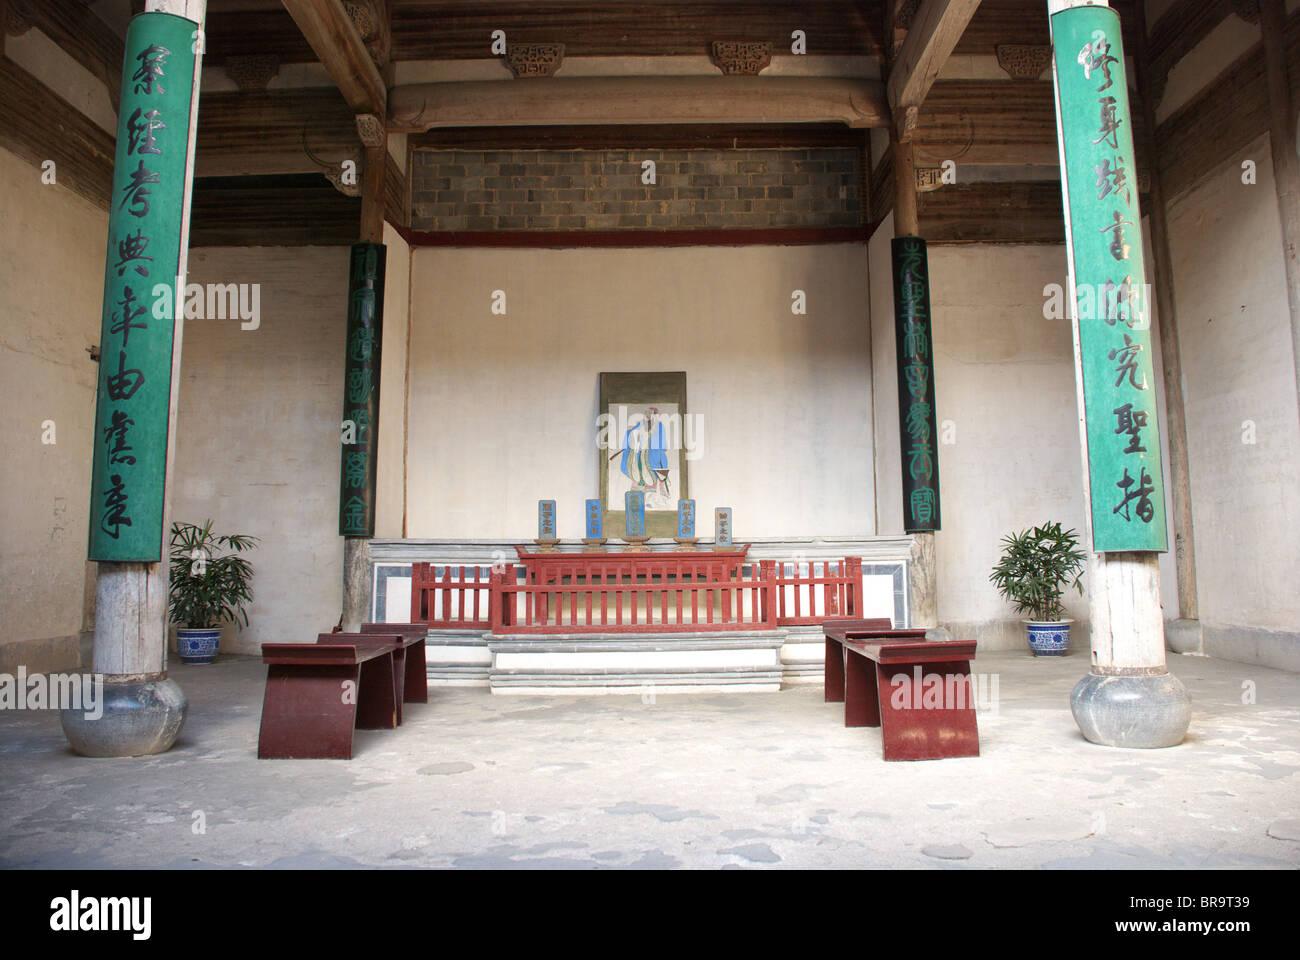 Verehrung Konfuzius Stockbild